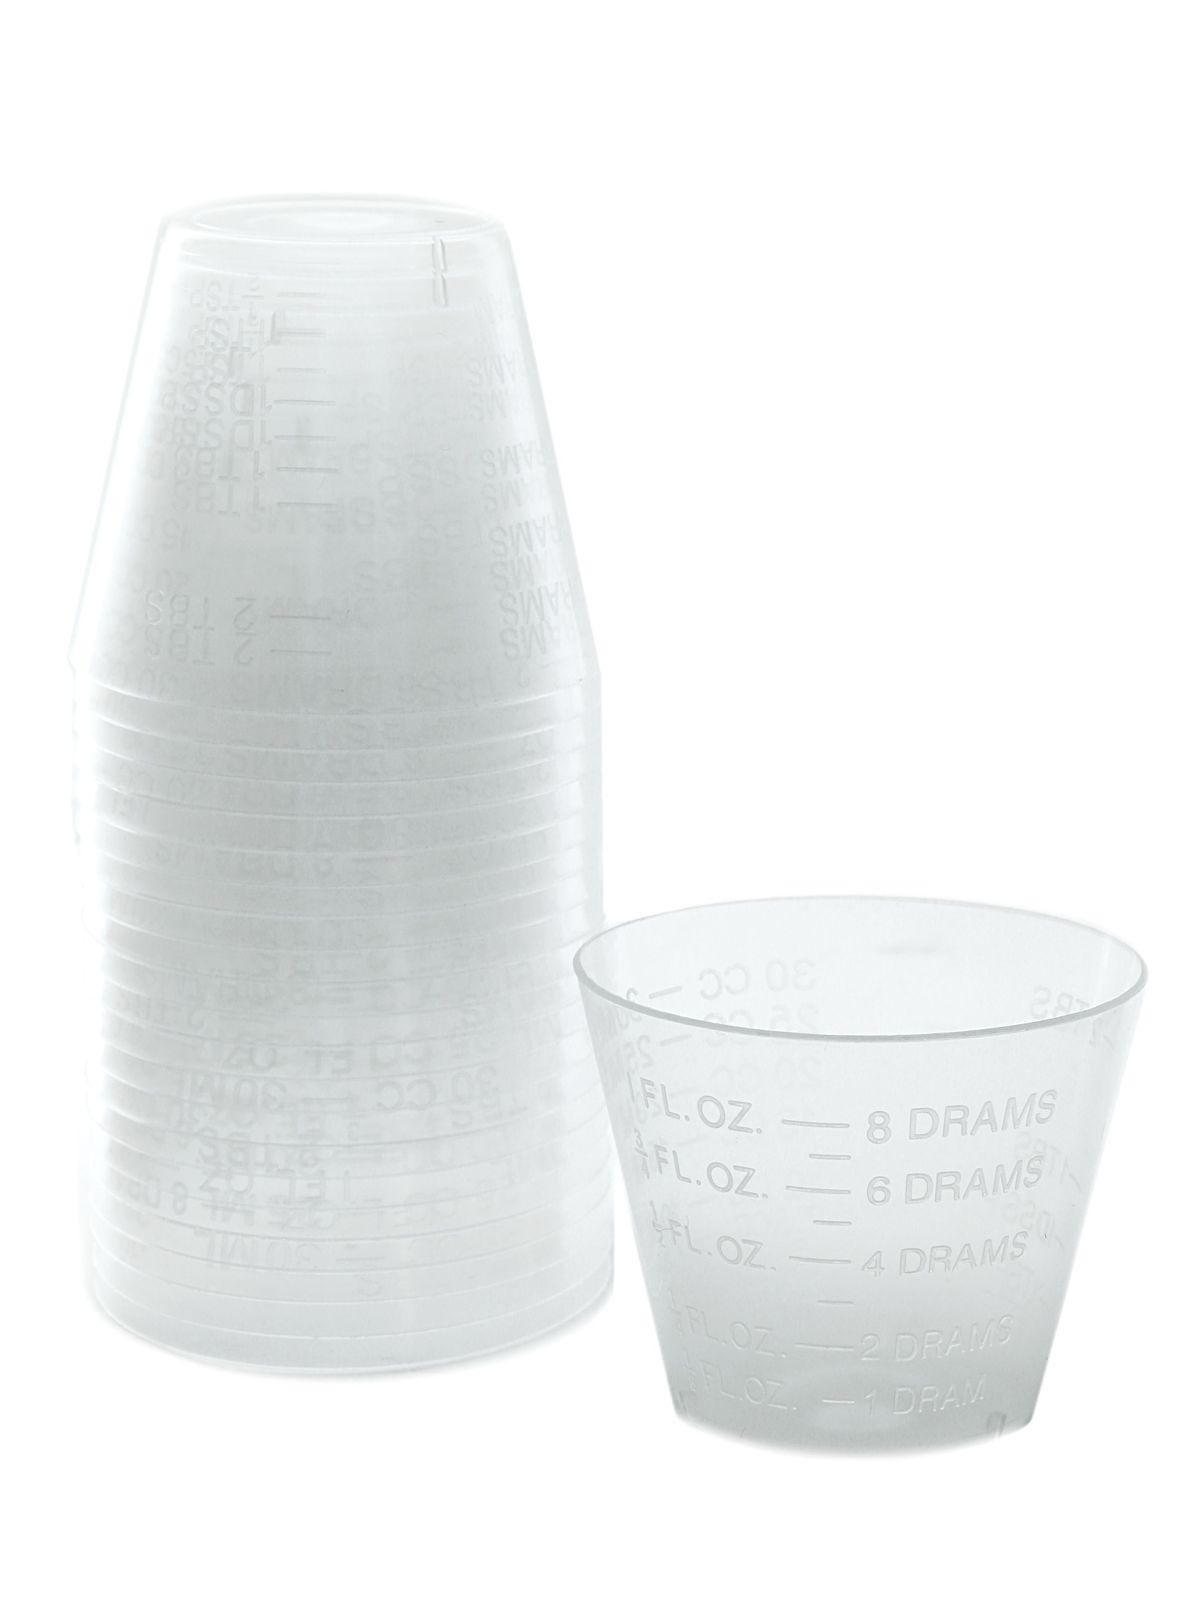 Alumilite - 1 oz. Graduated Measuring Cups